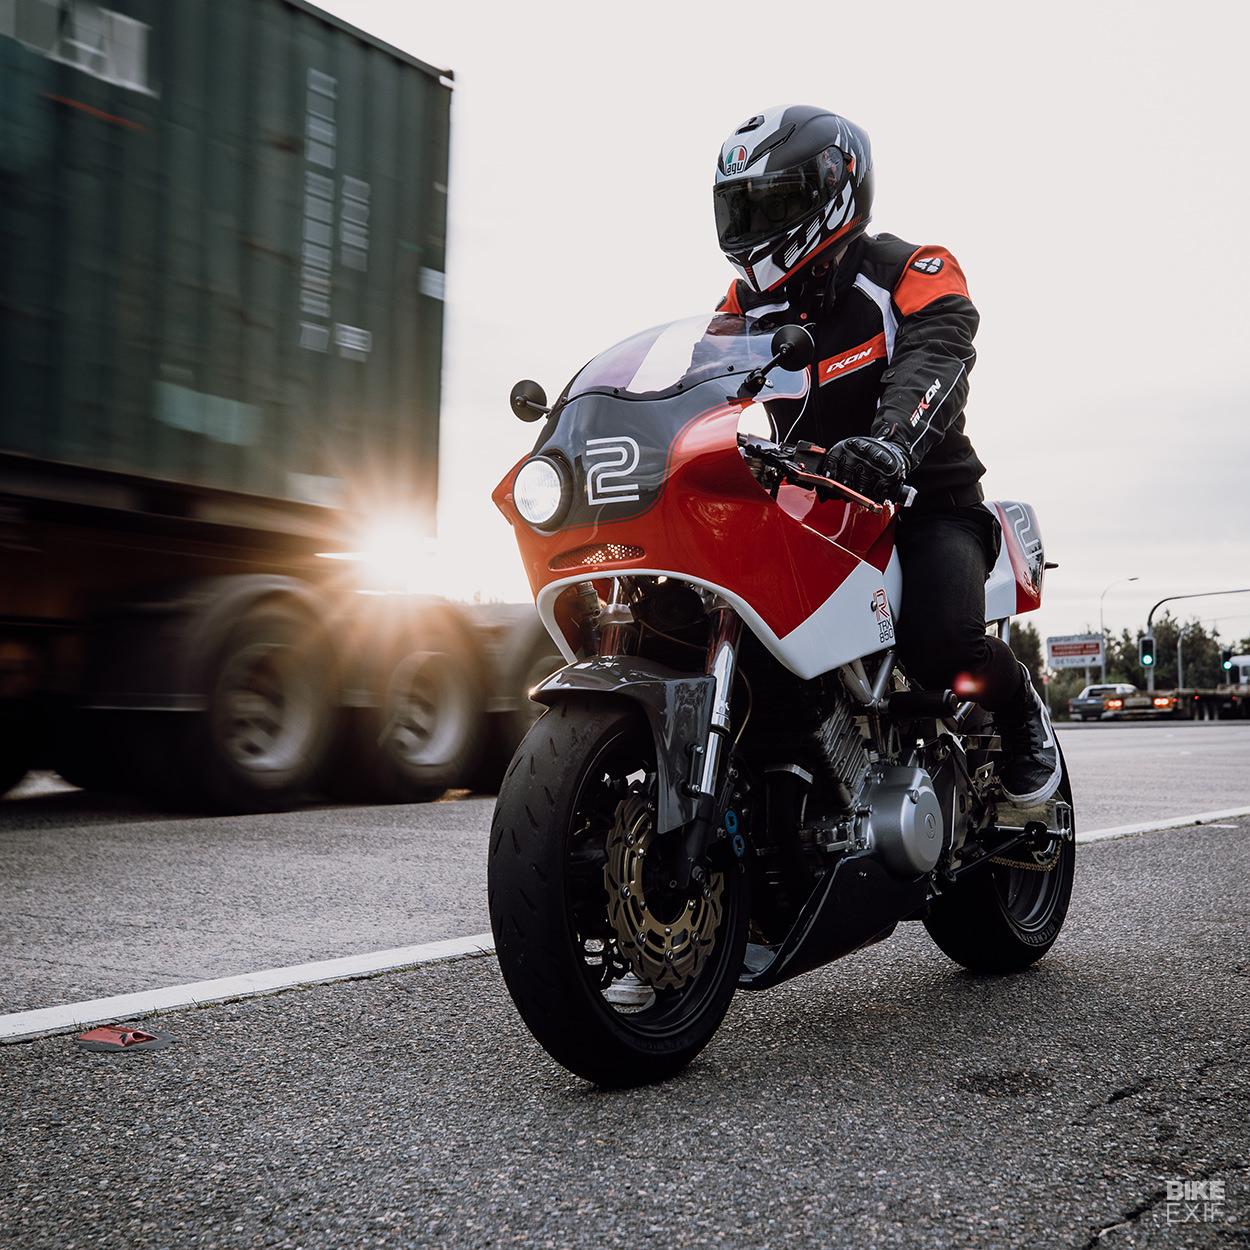 Endurance racer-style custom Yamaha TRX850